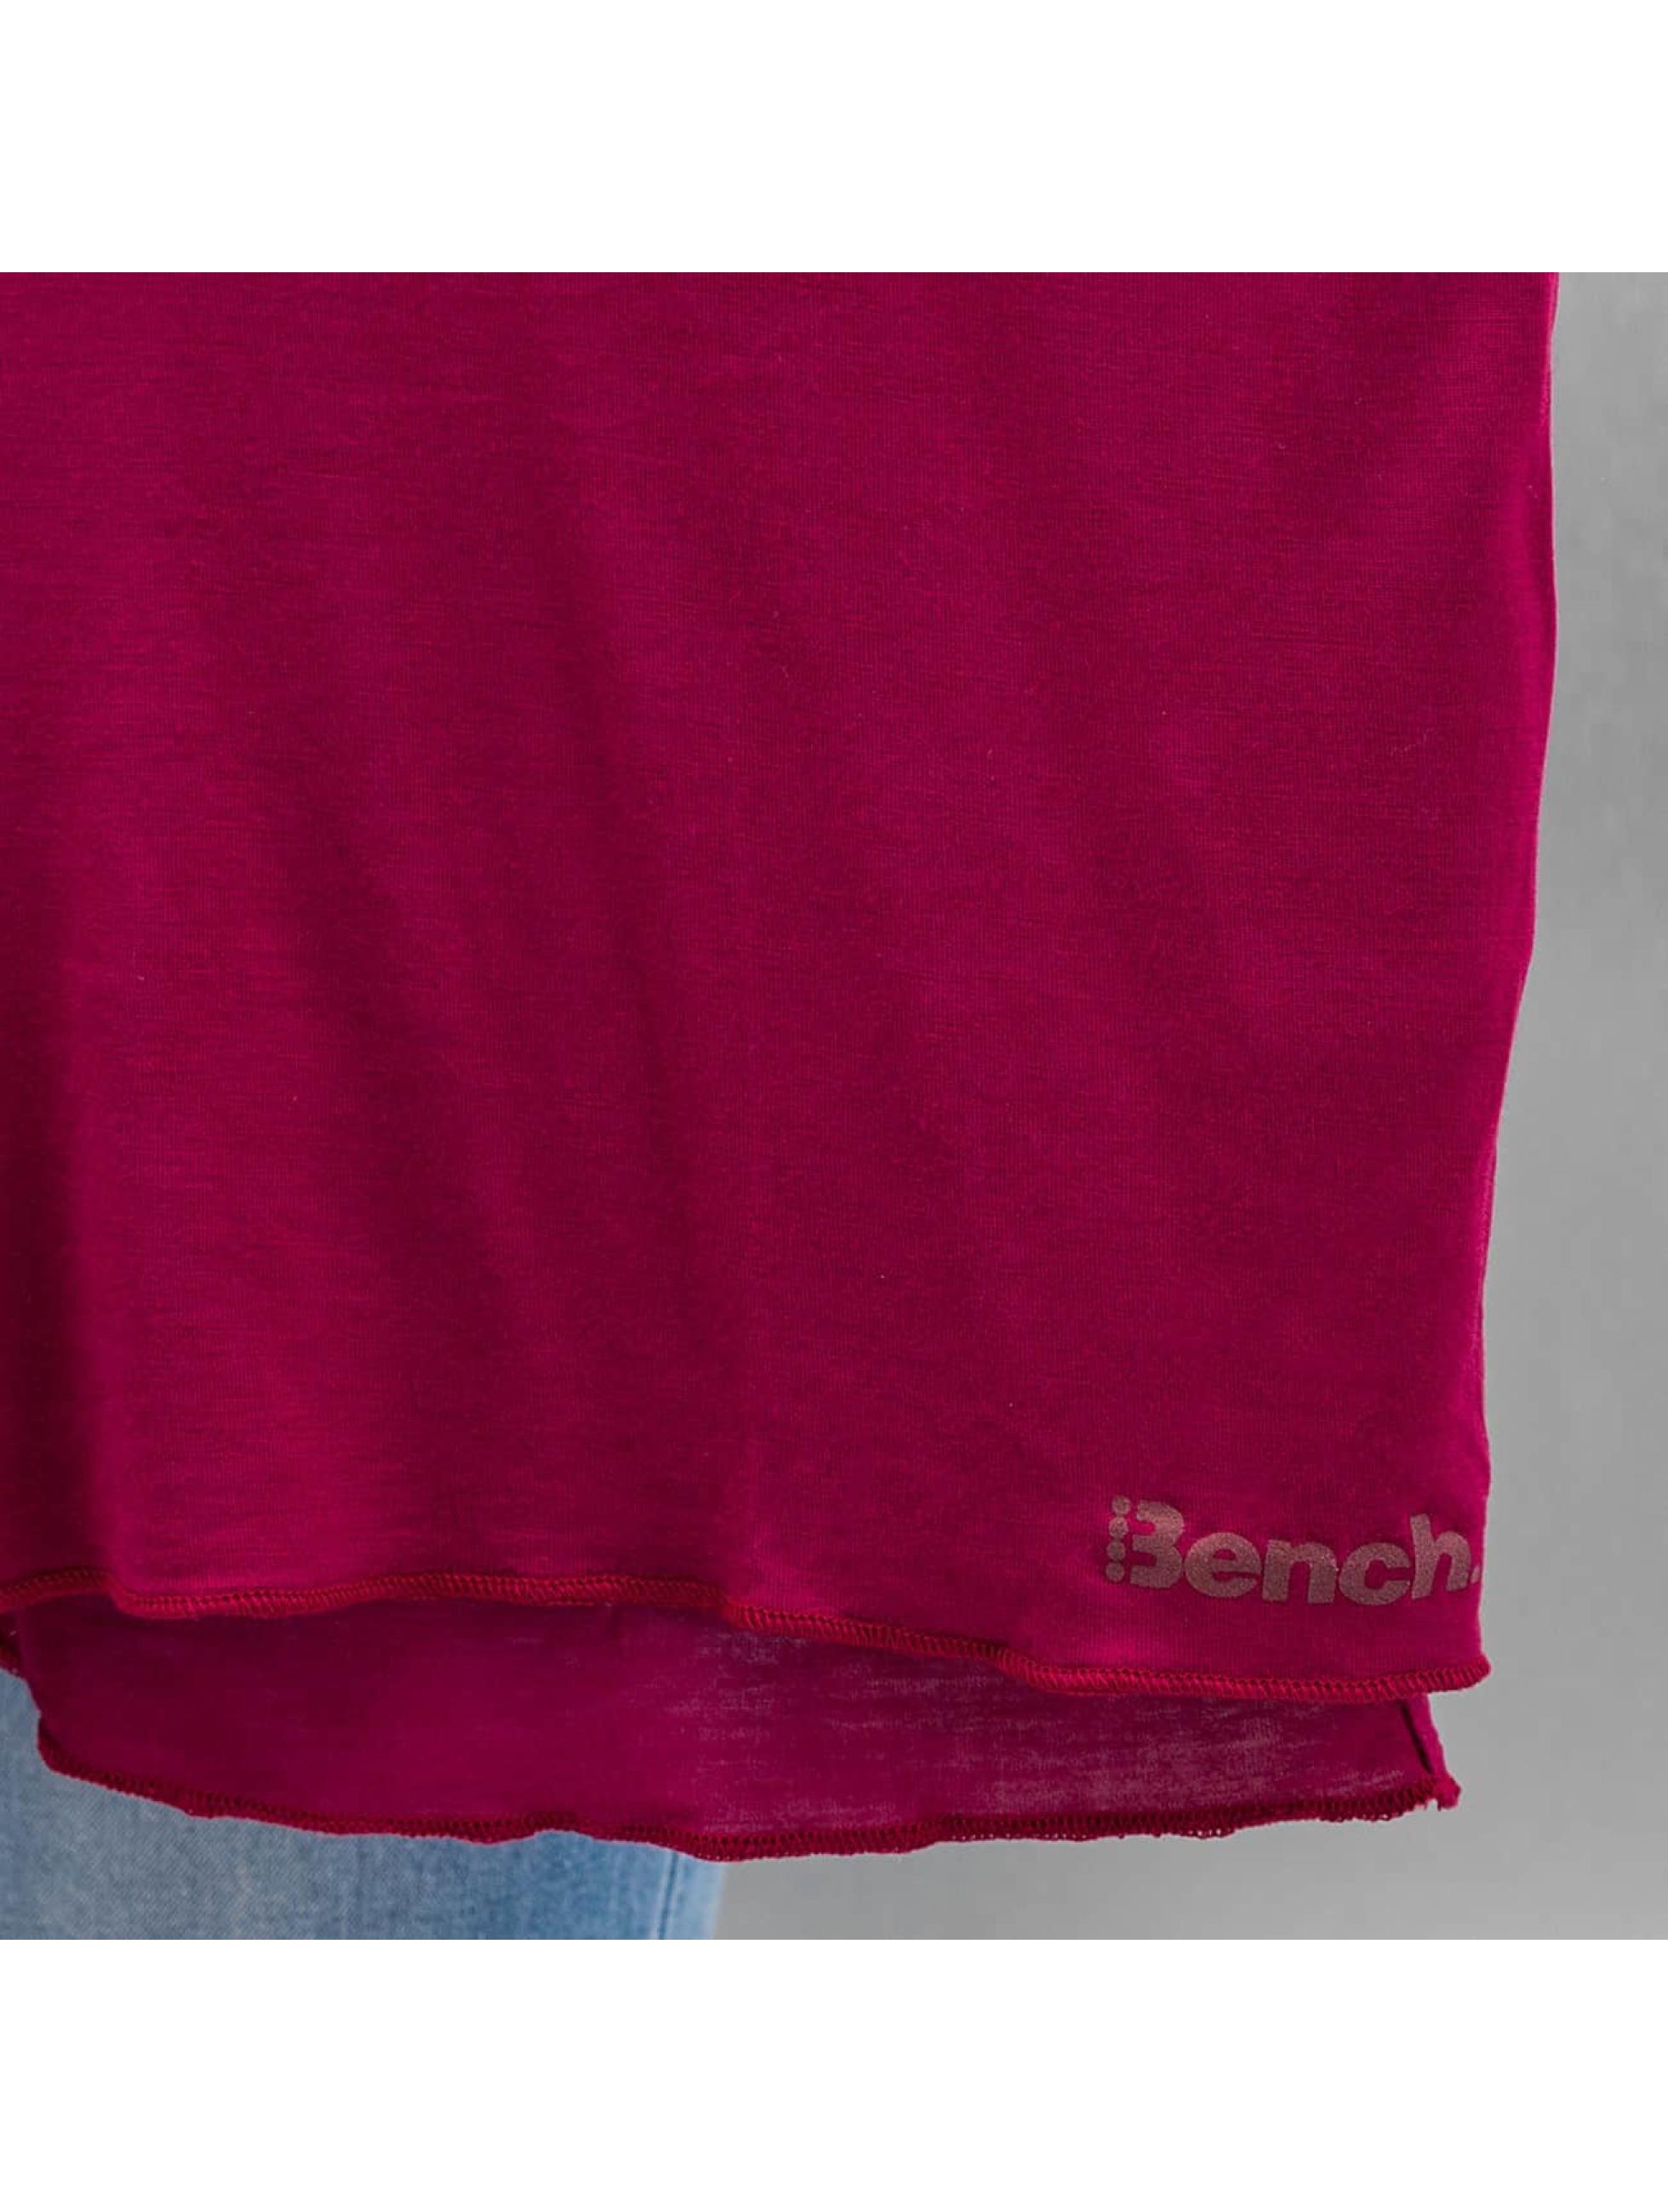 Bench Longsleeve Performance Addendum Oversize rood